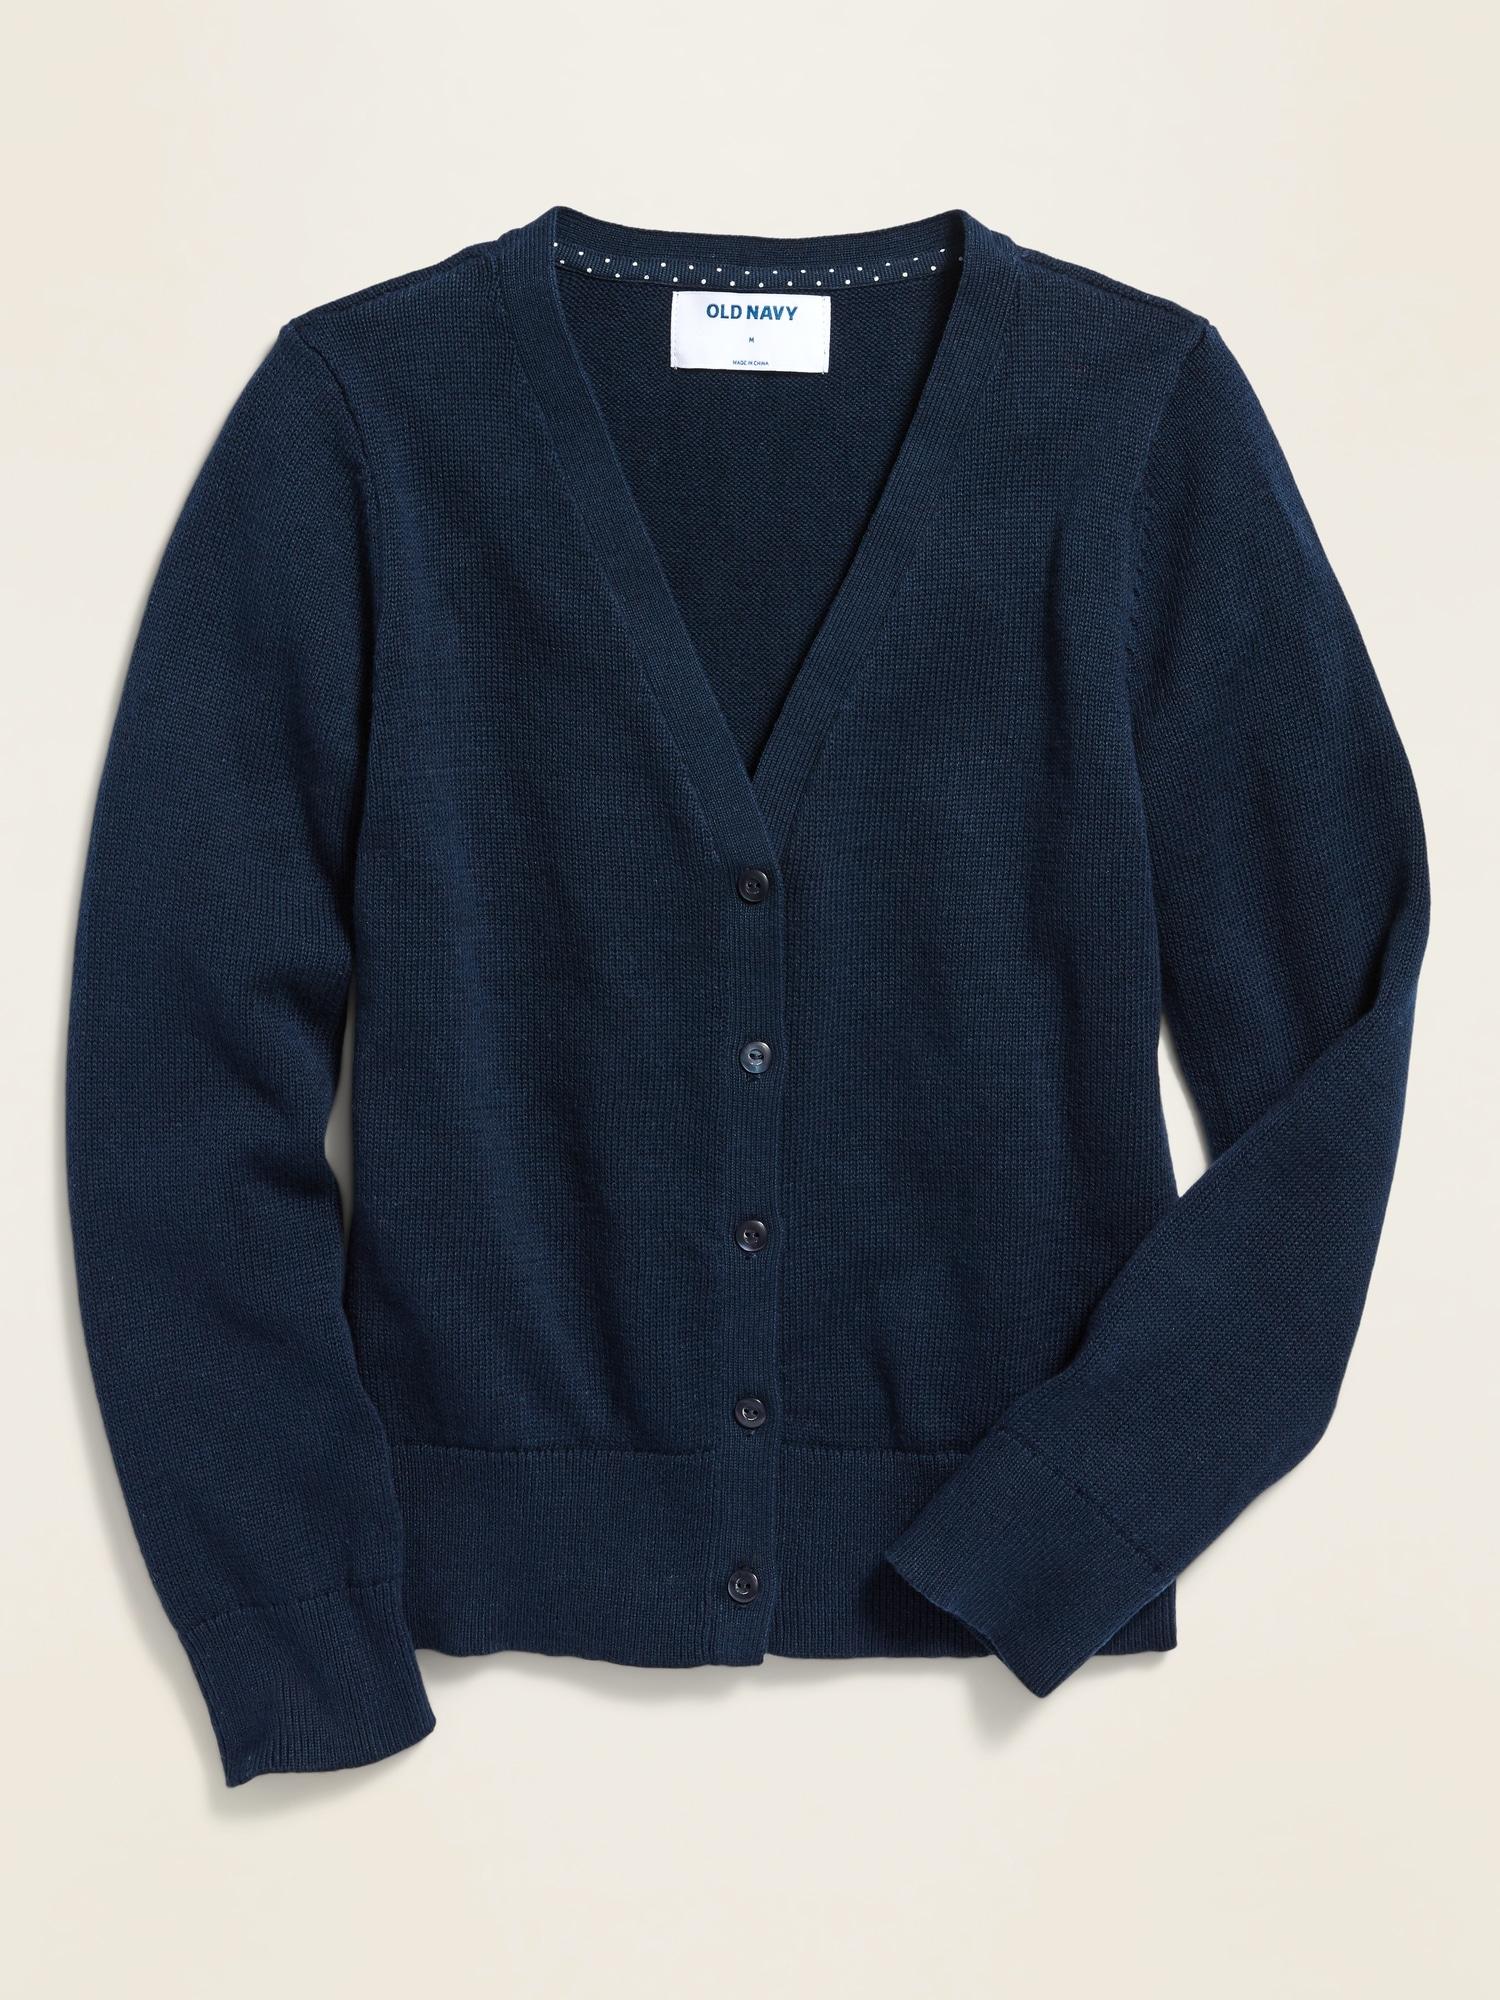 *Best Seller* Uniform V-Neck Cardigan for Girls